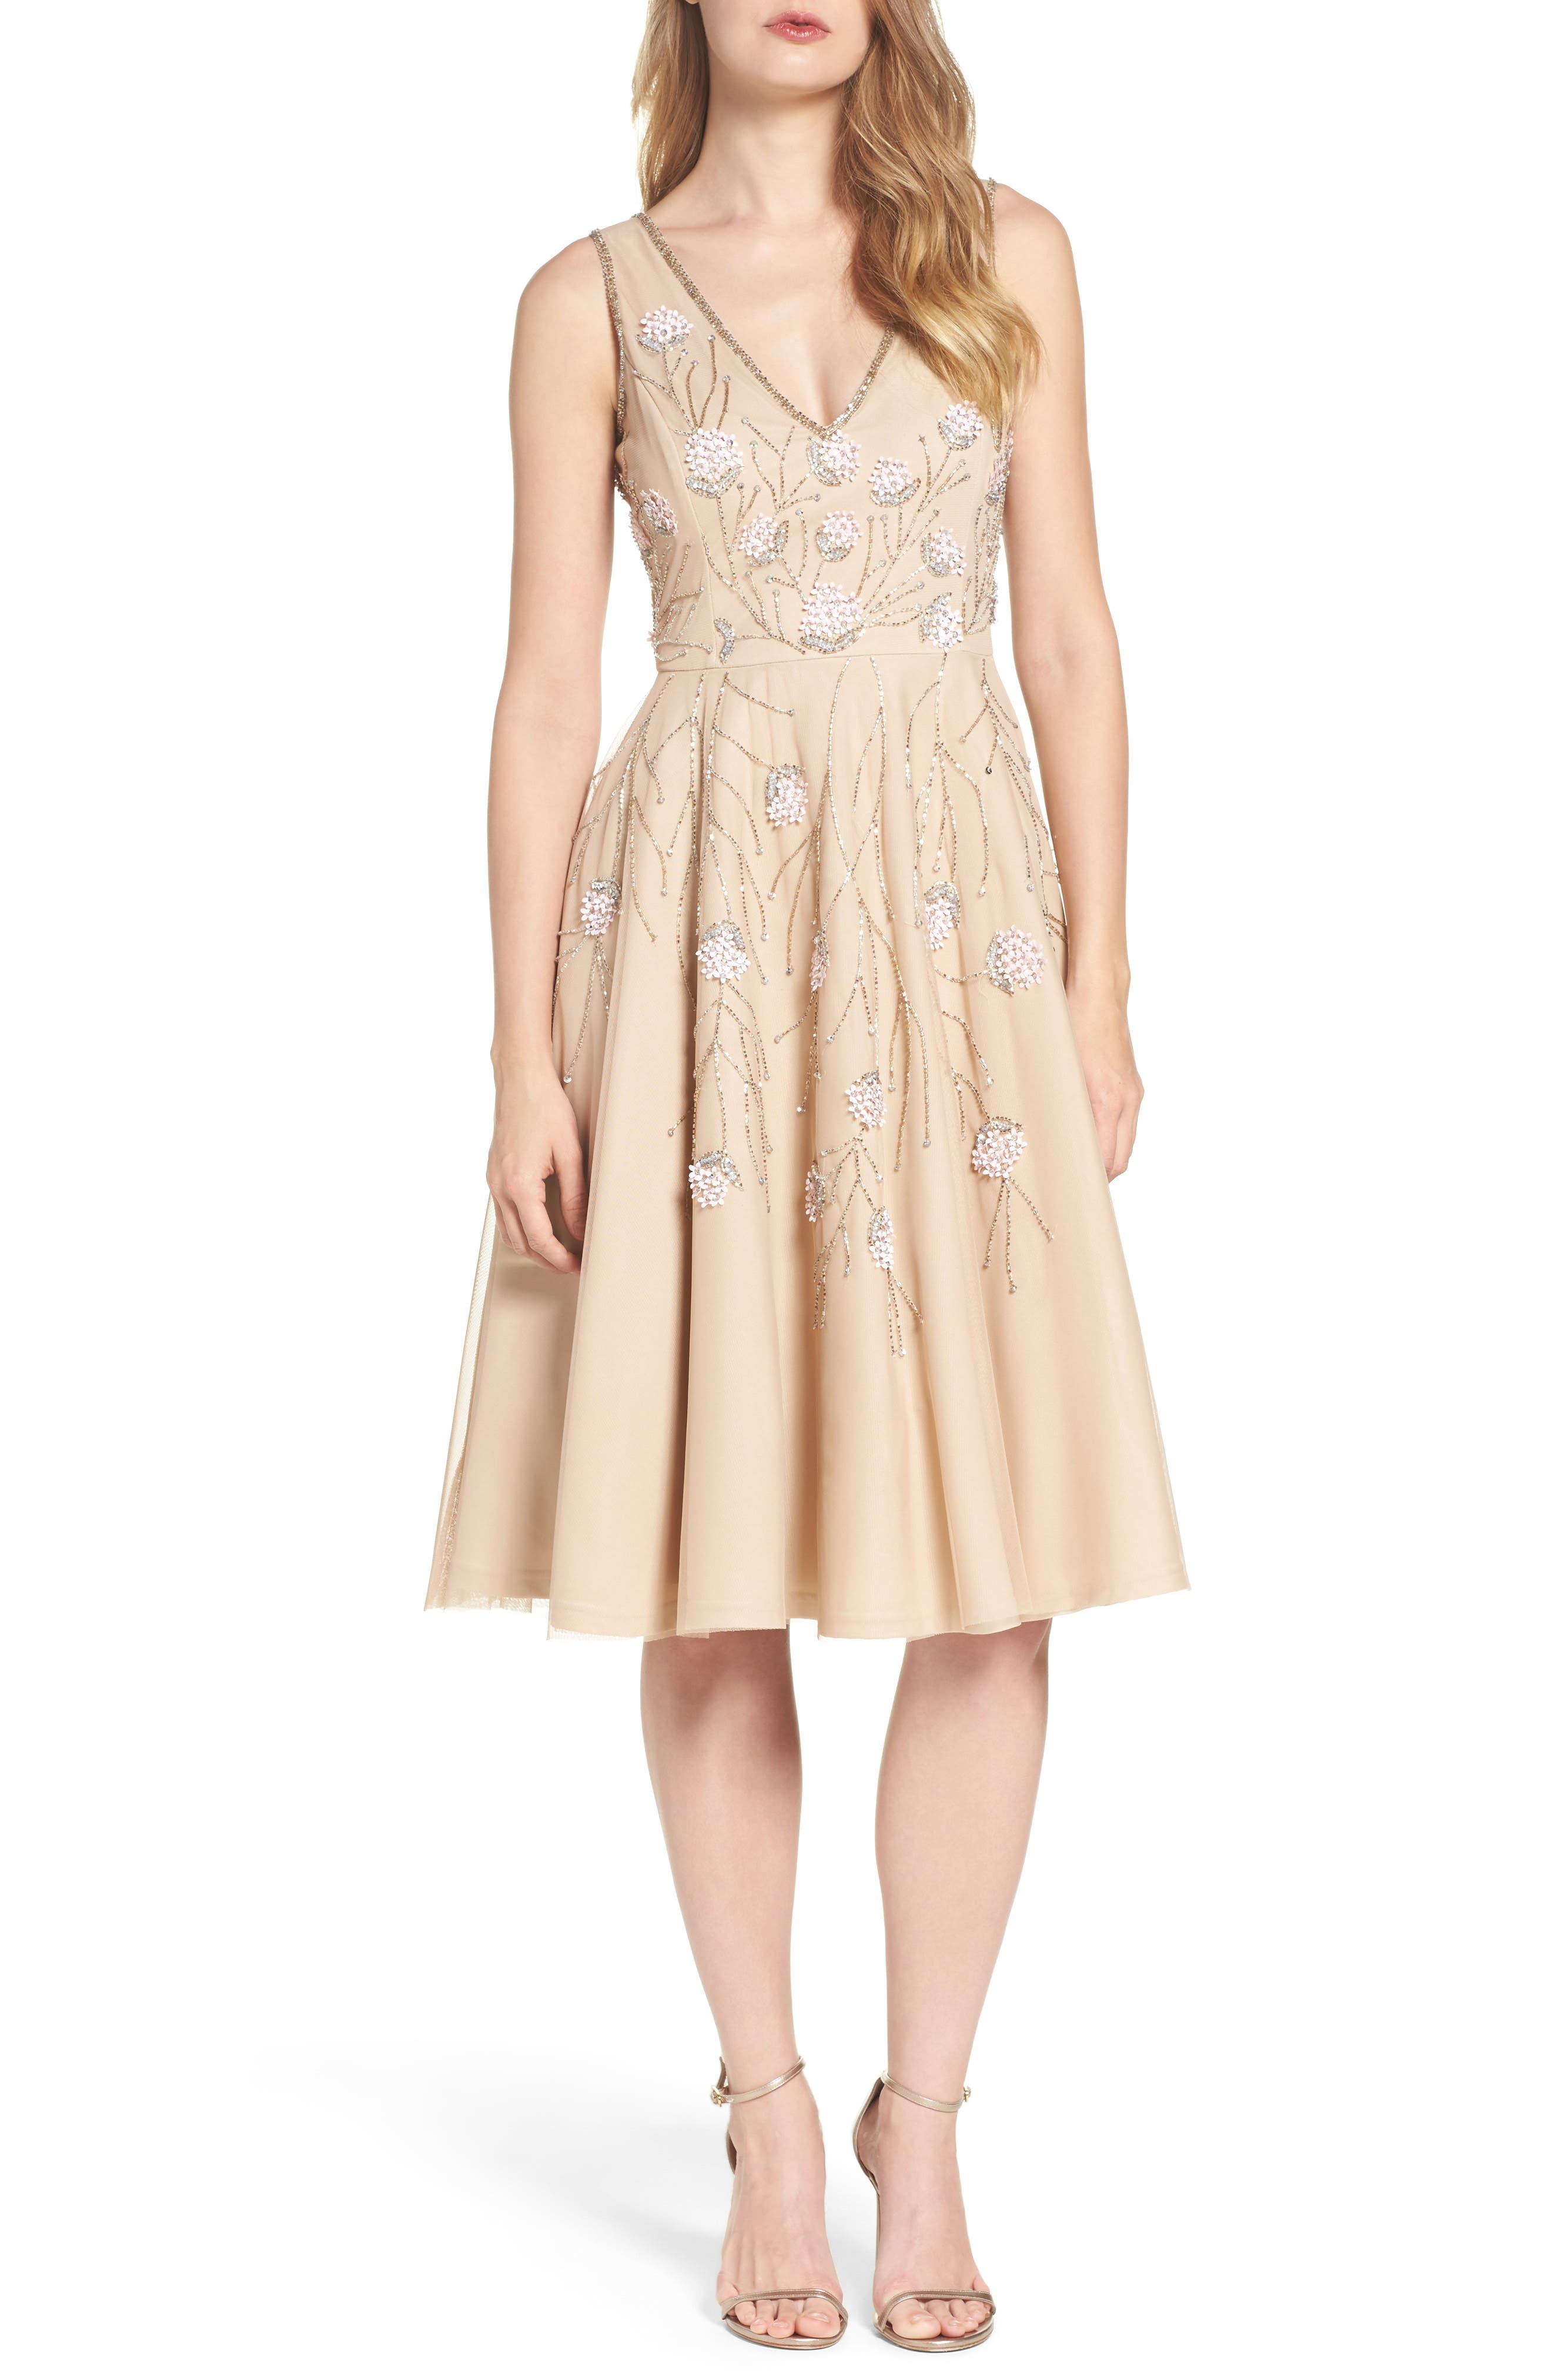 Alternate Image 1 Selected - Adrianna Papell Embellished Dress